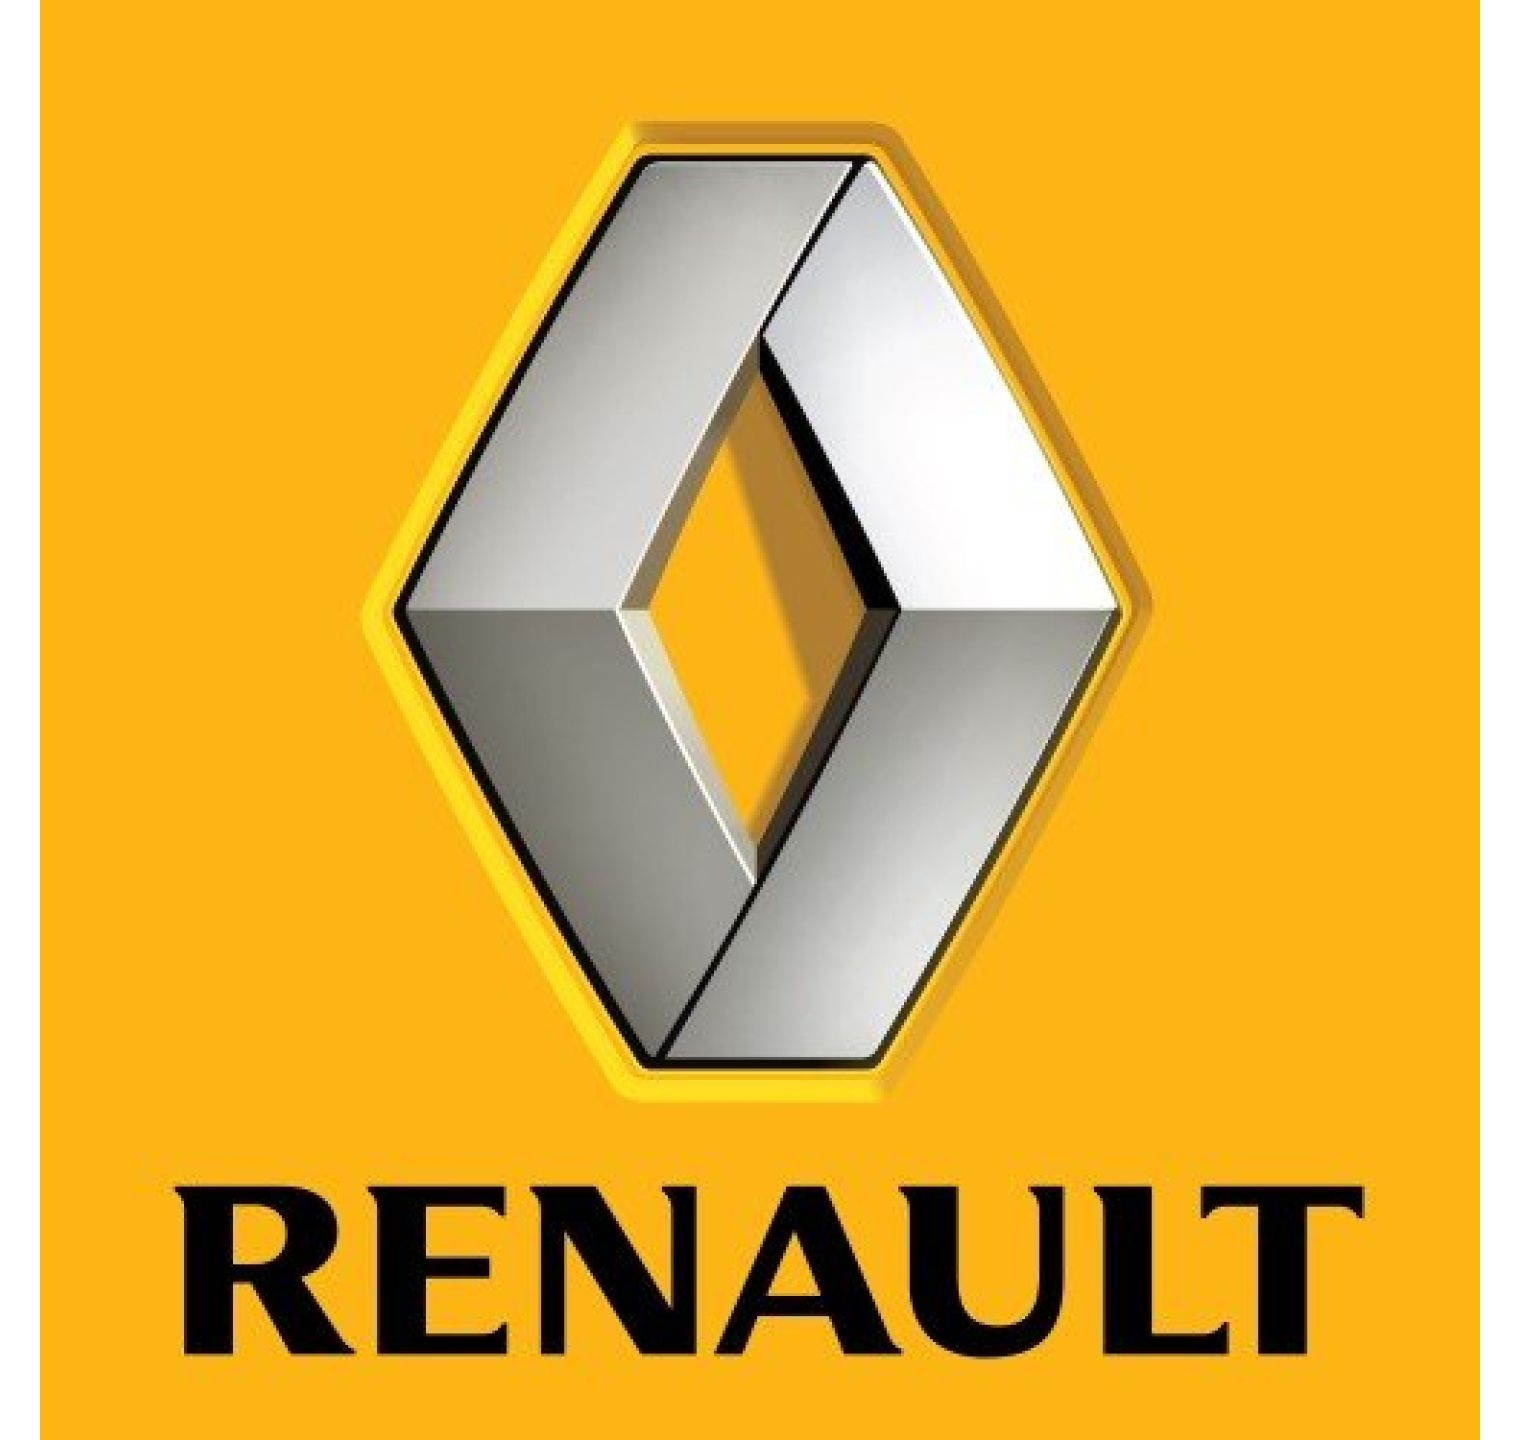 Renault Megane I Grandtour (1999 t/m 2003) - achterruitenwisser Valeo Silencio flatblade